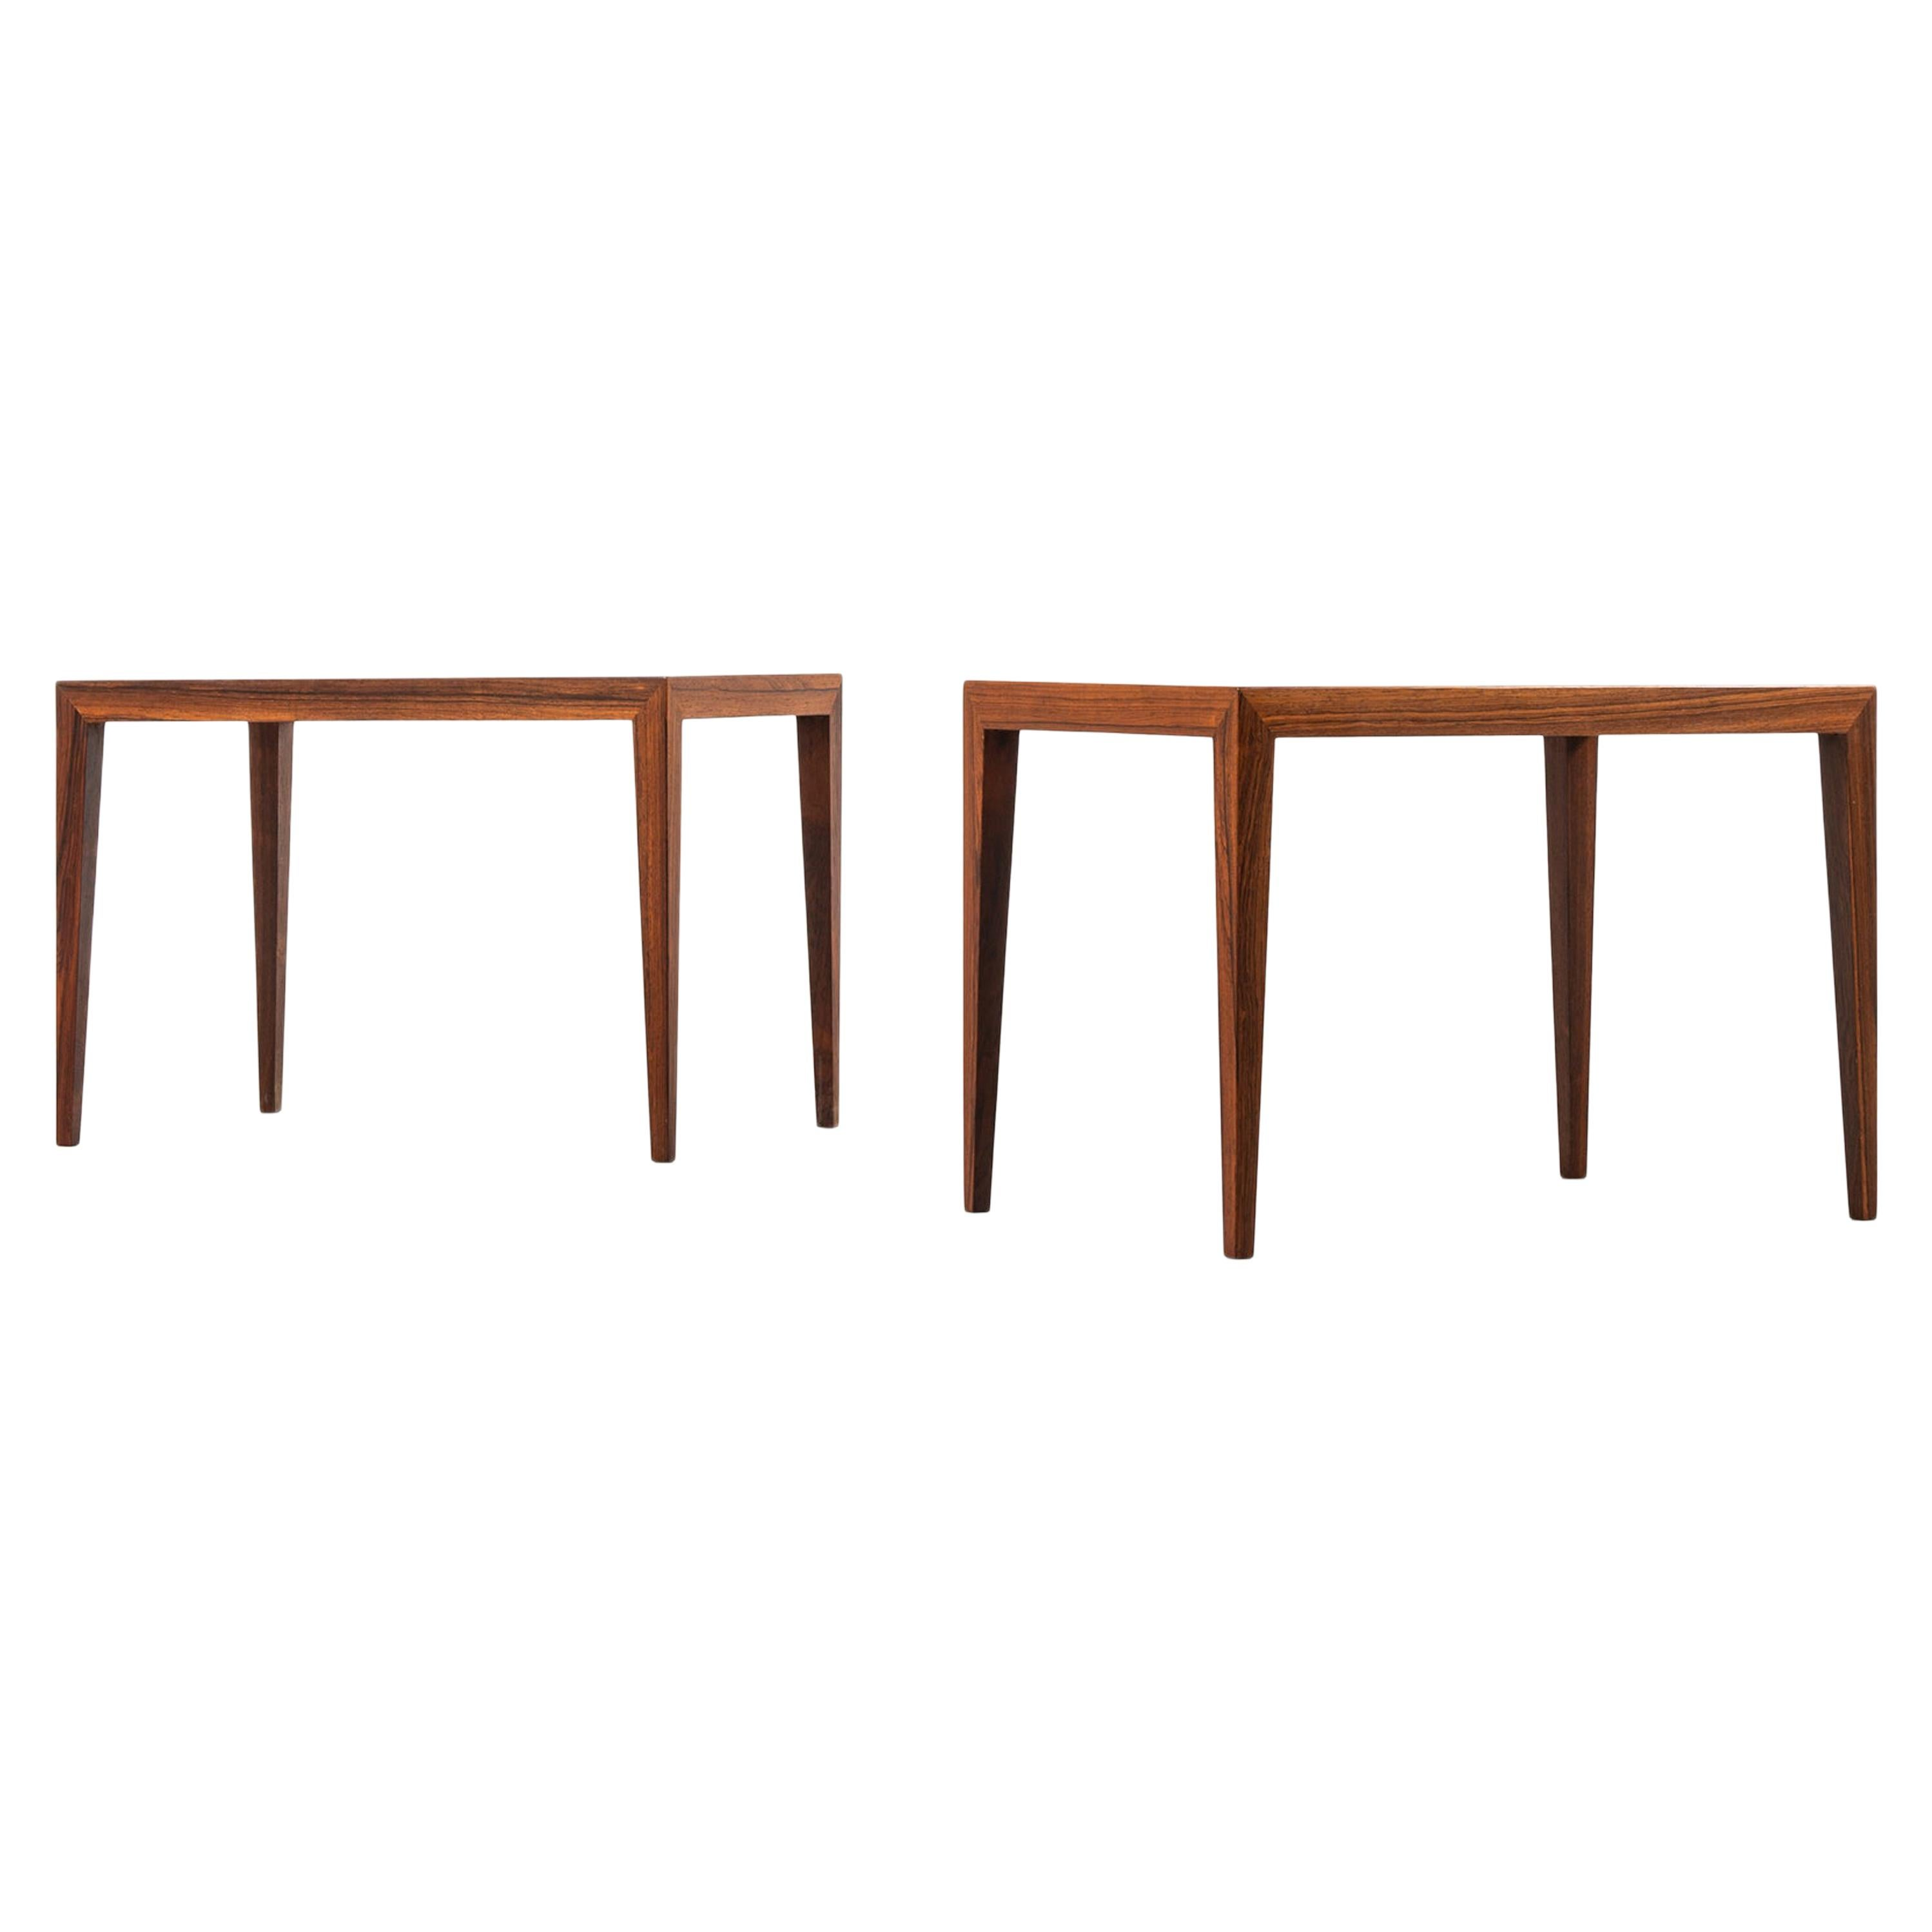 Severin Hansen Side Tables Produced by Haslev Mobelsnedkeri in Denmark